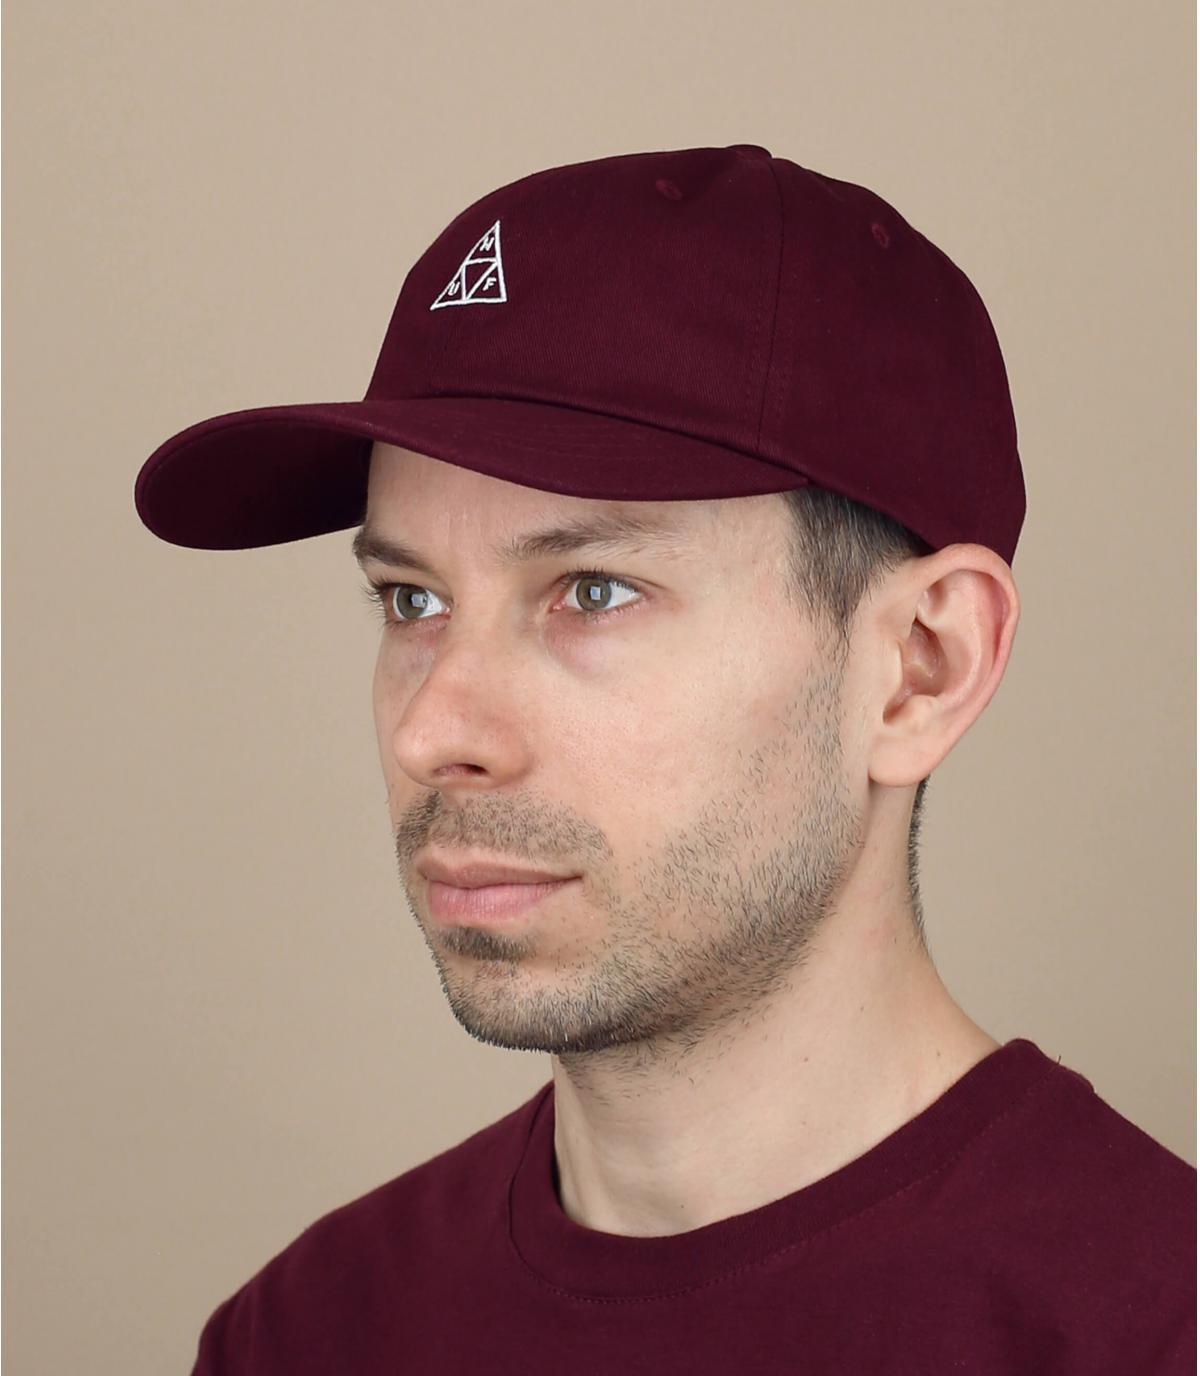 cappellino bordeaux Huf